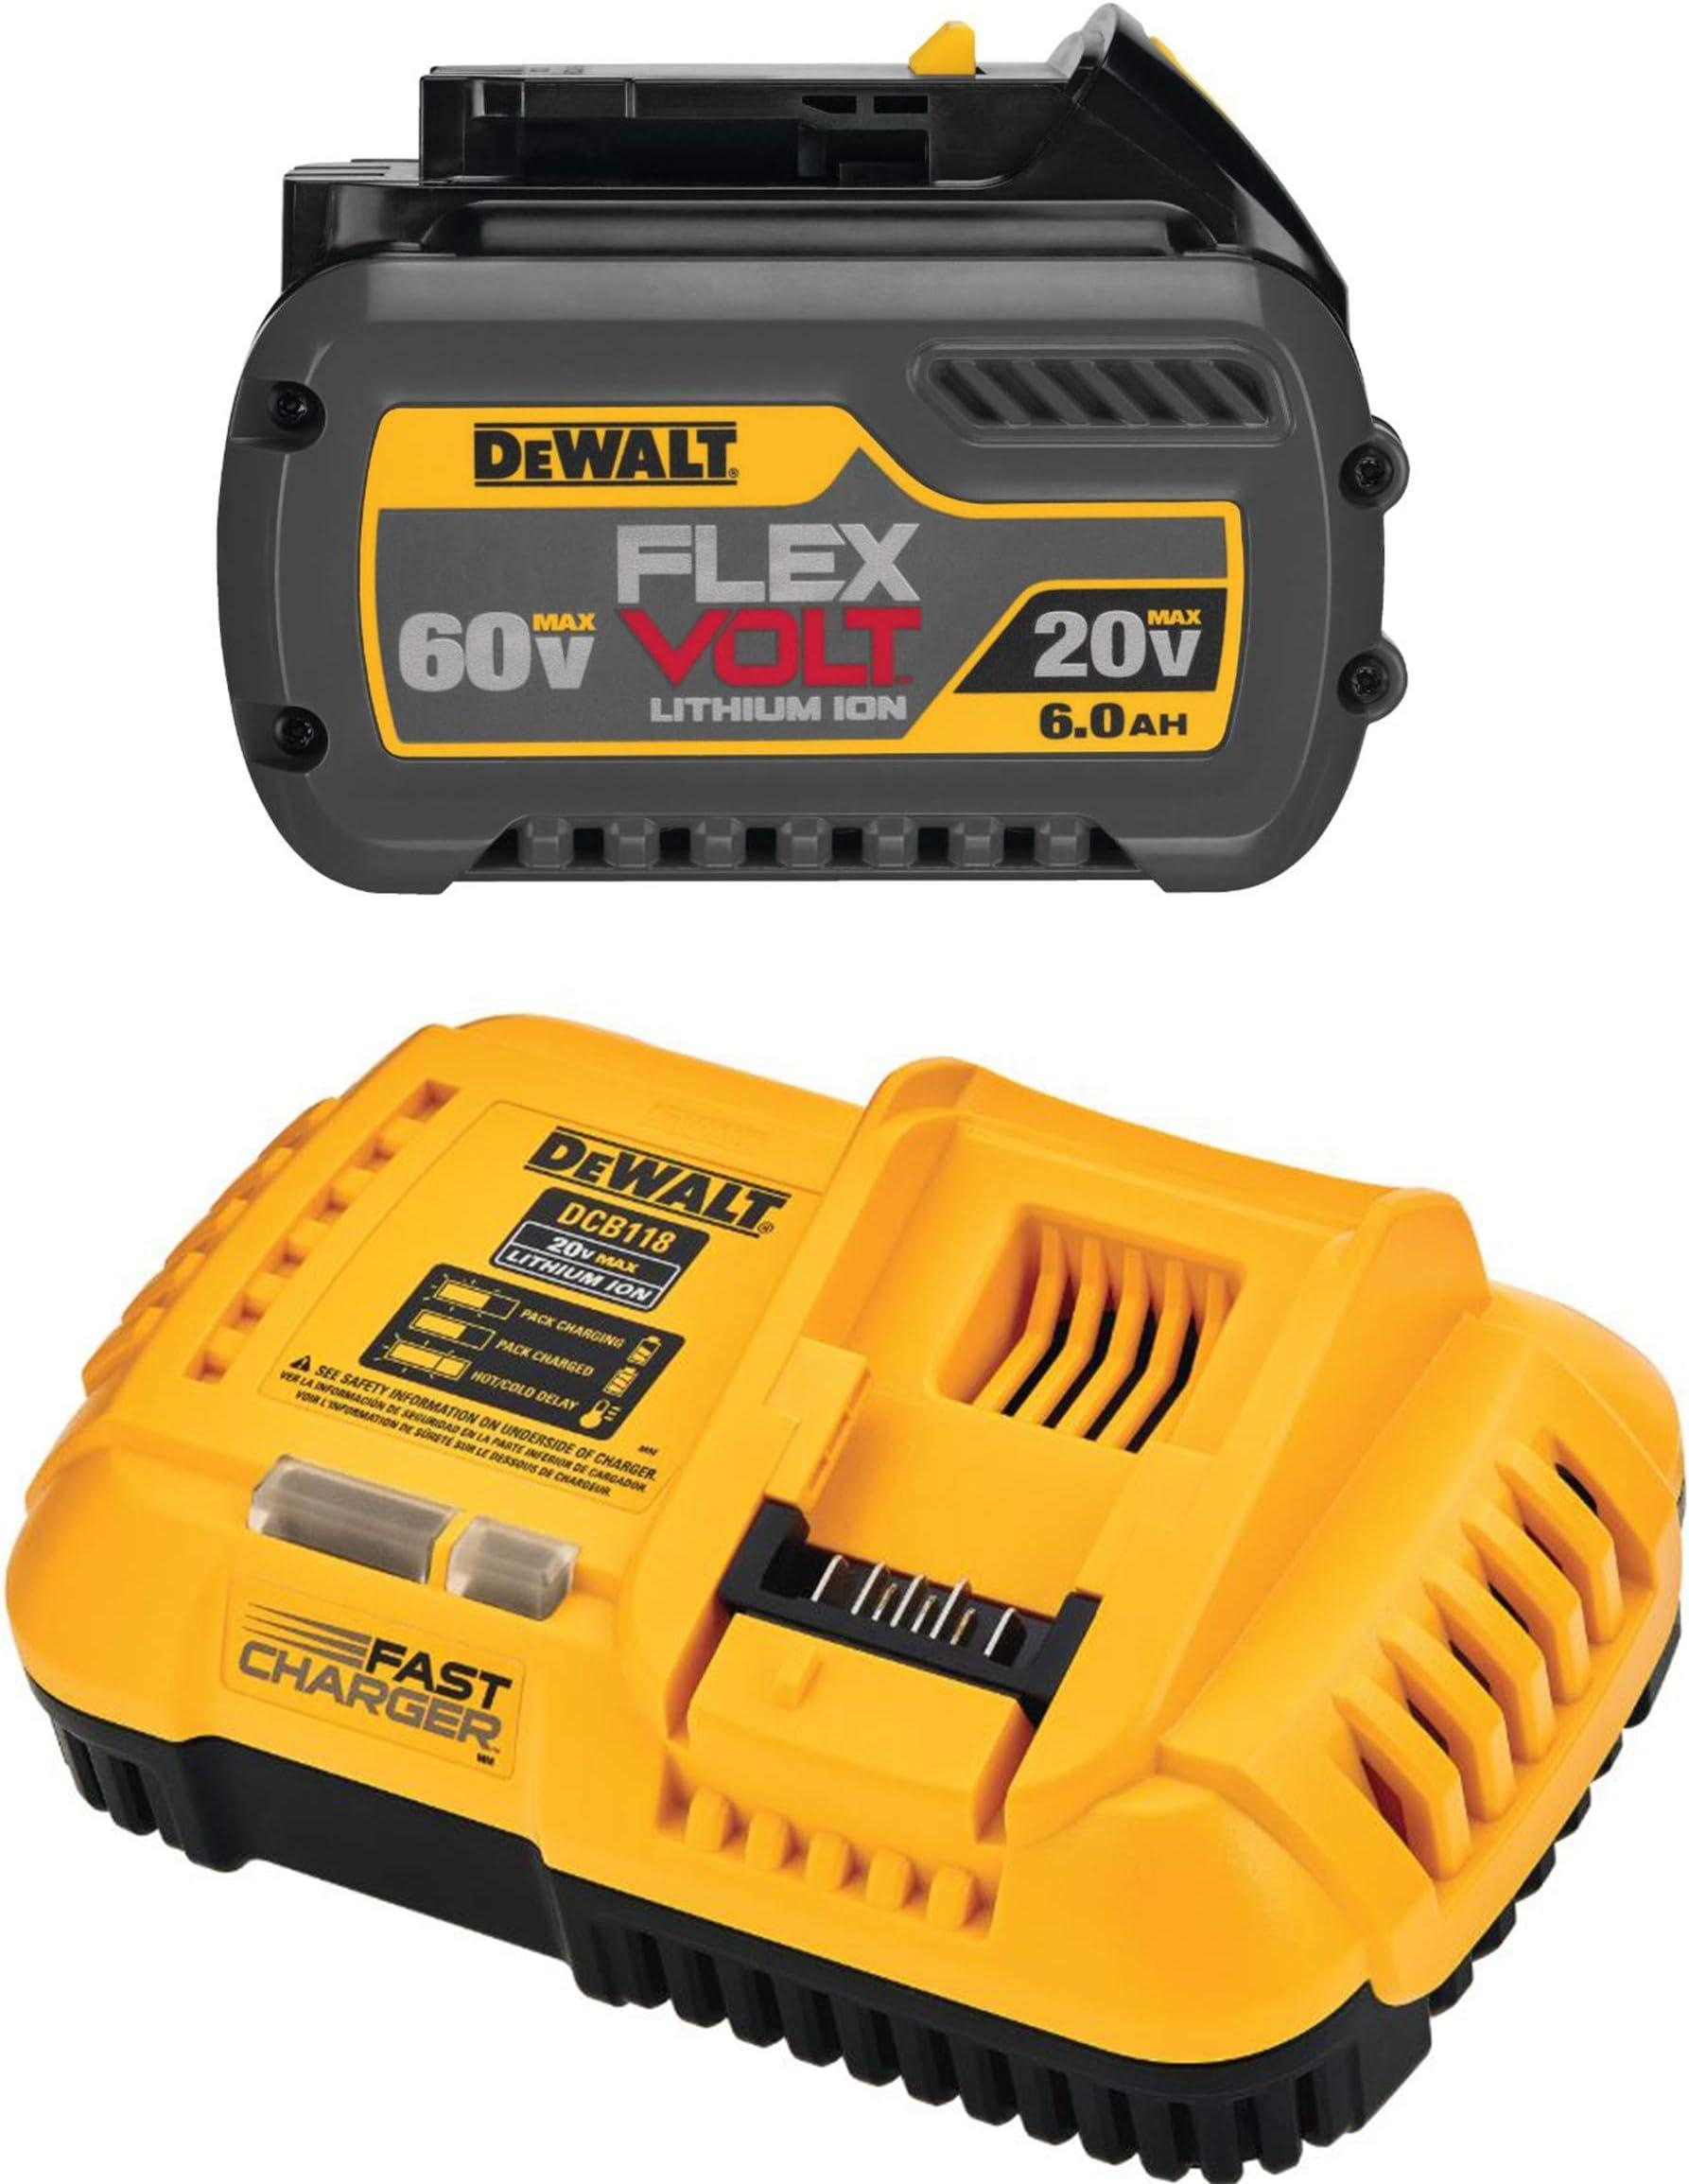 Dewalt Dcb606 And Dcb118 Battery And Rapid Charger Bundle Amazon Com